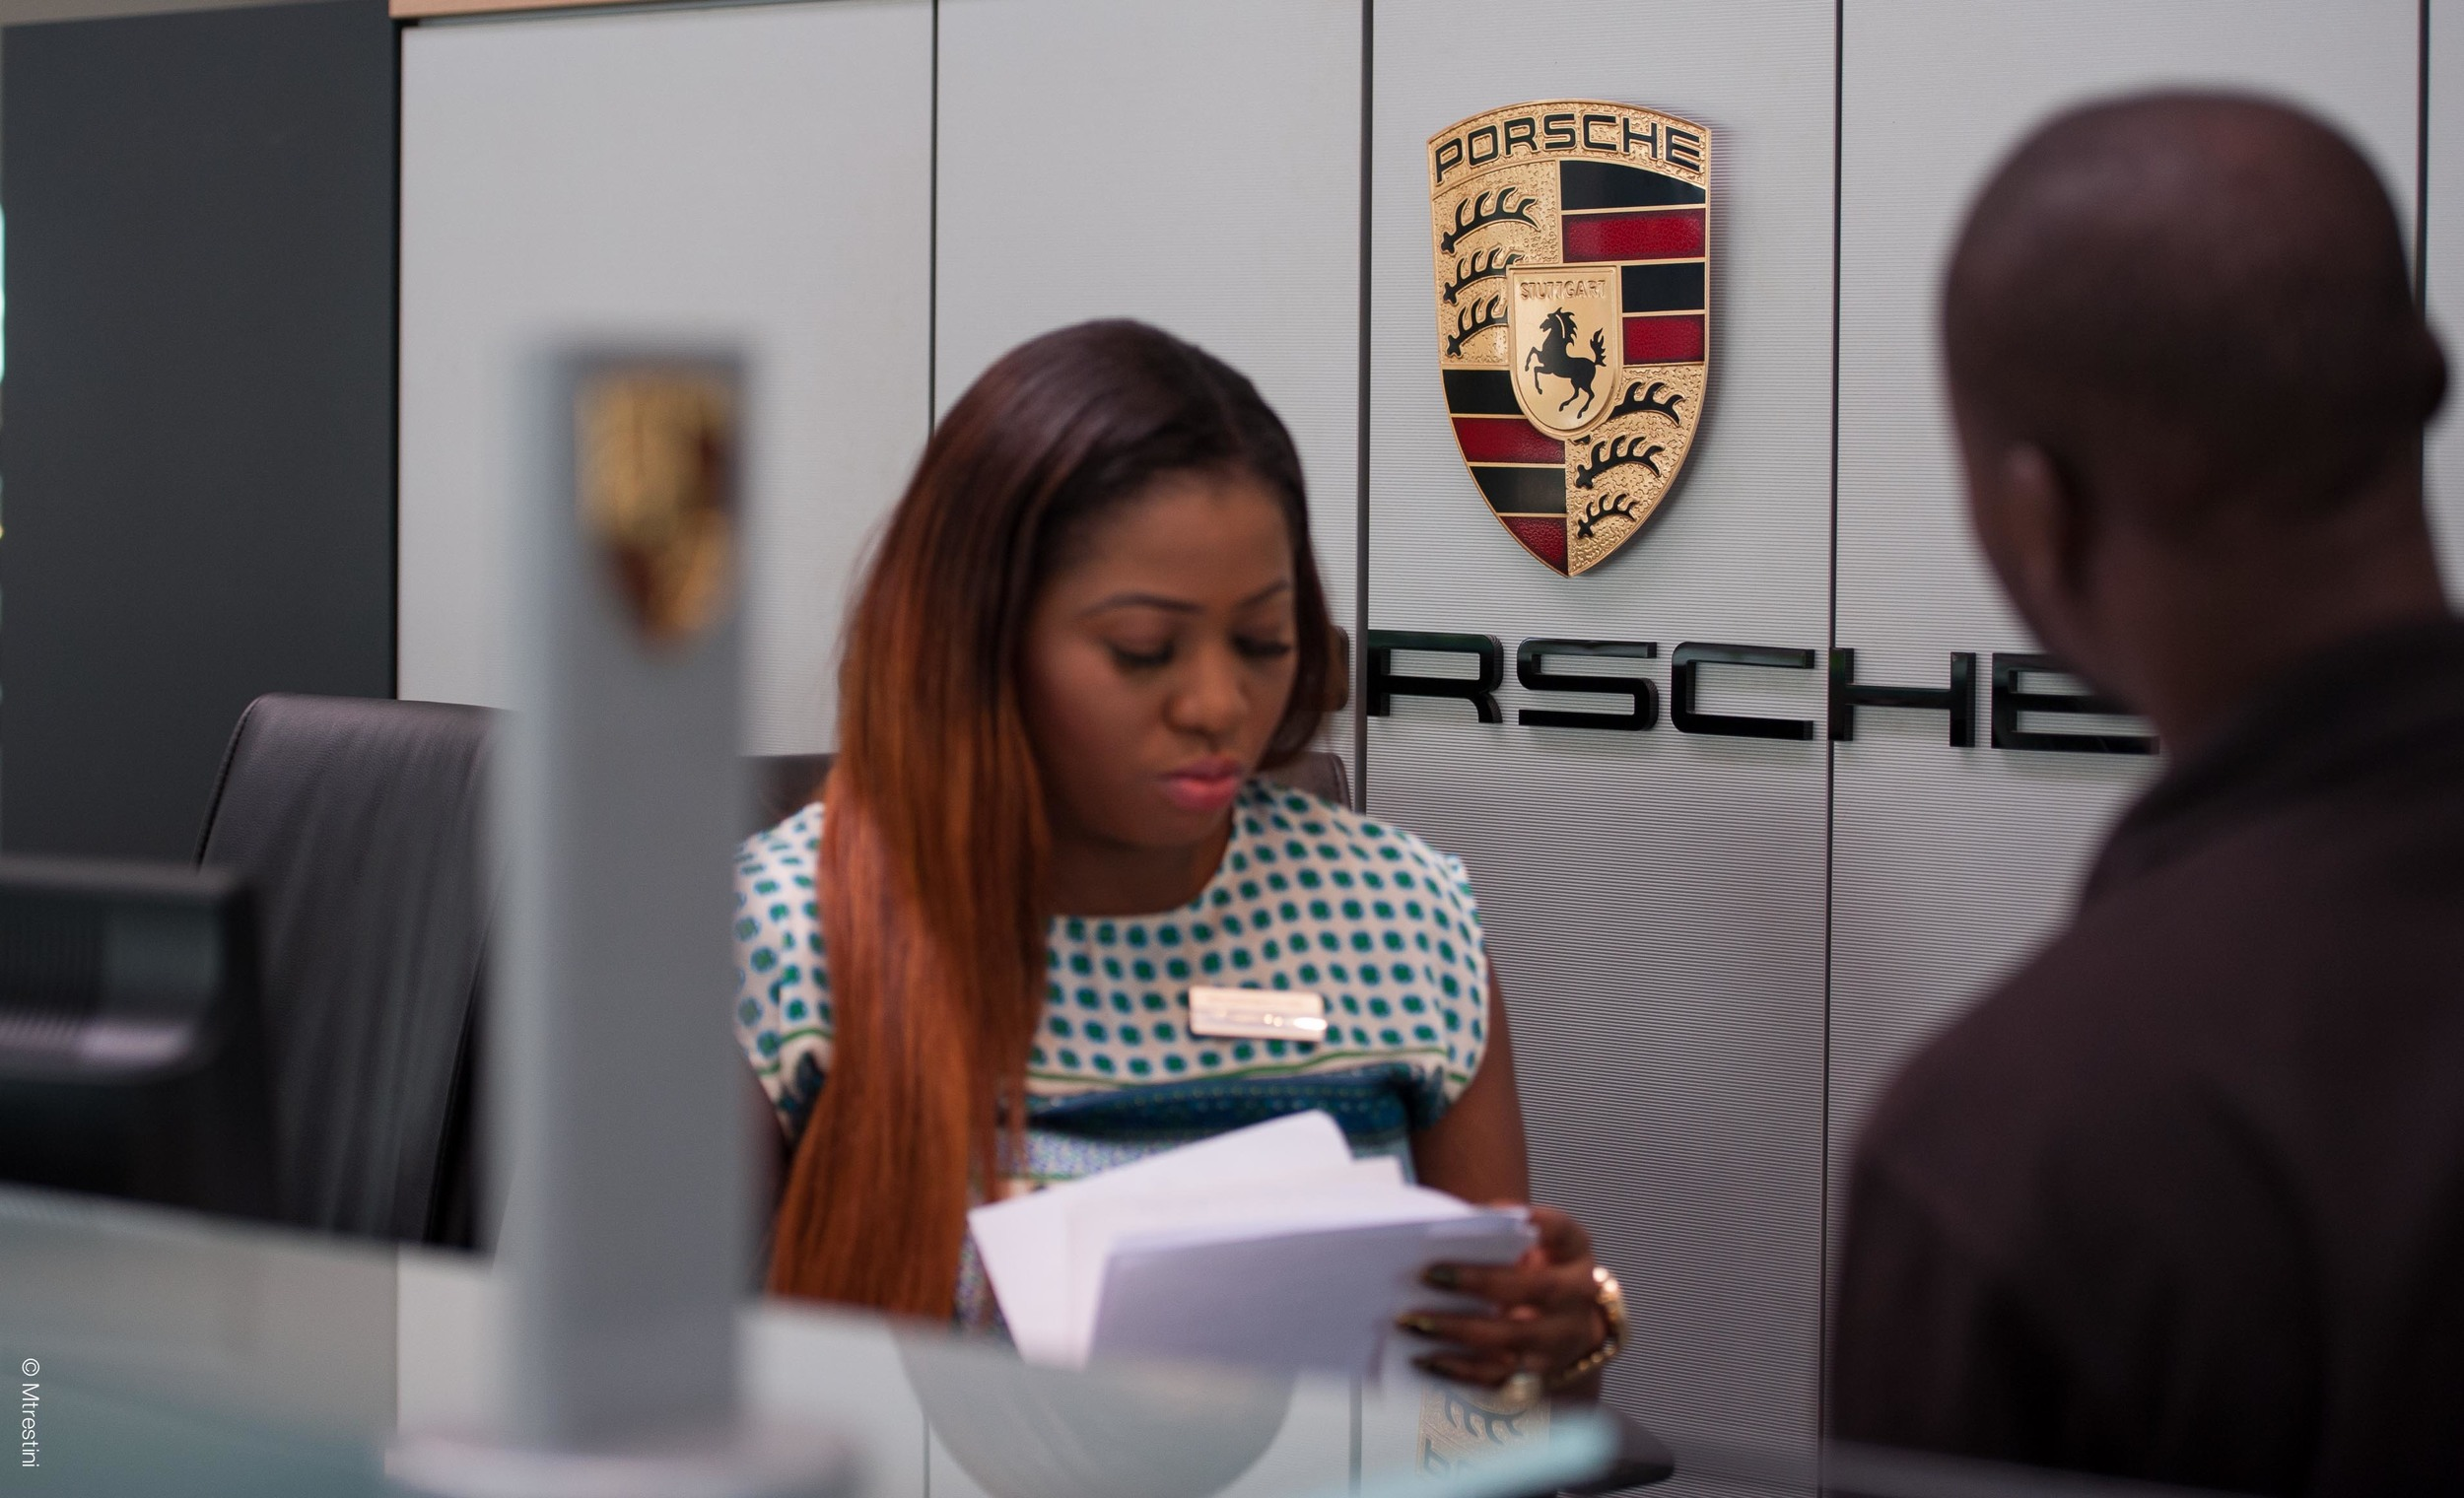 Porsche Showroom, Lagos,Nigeria